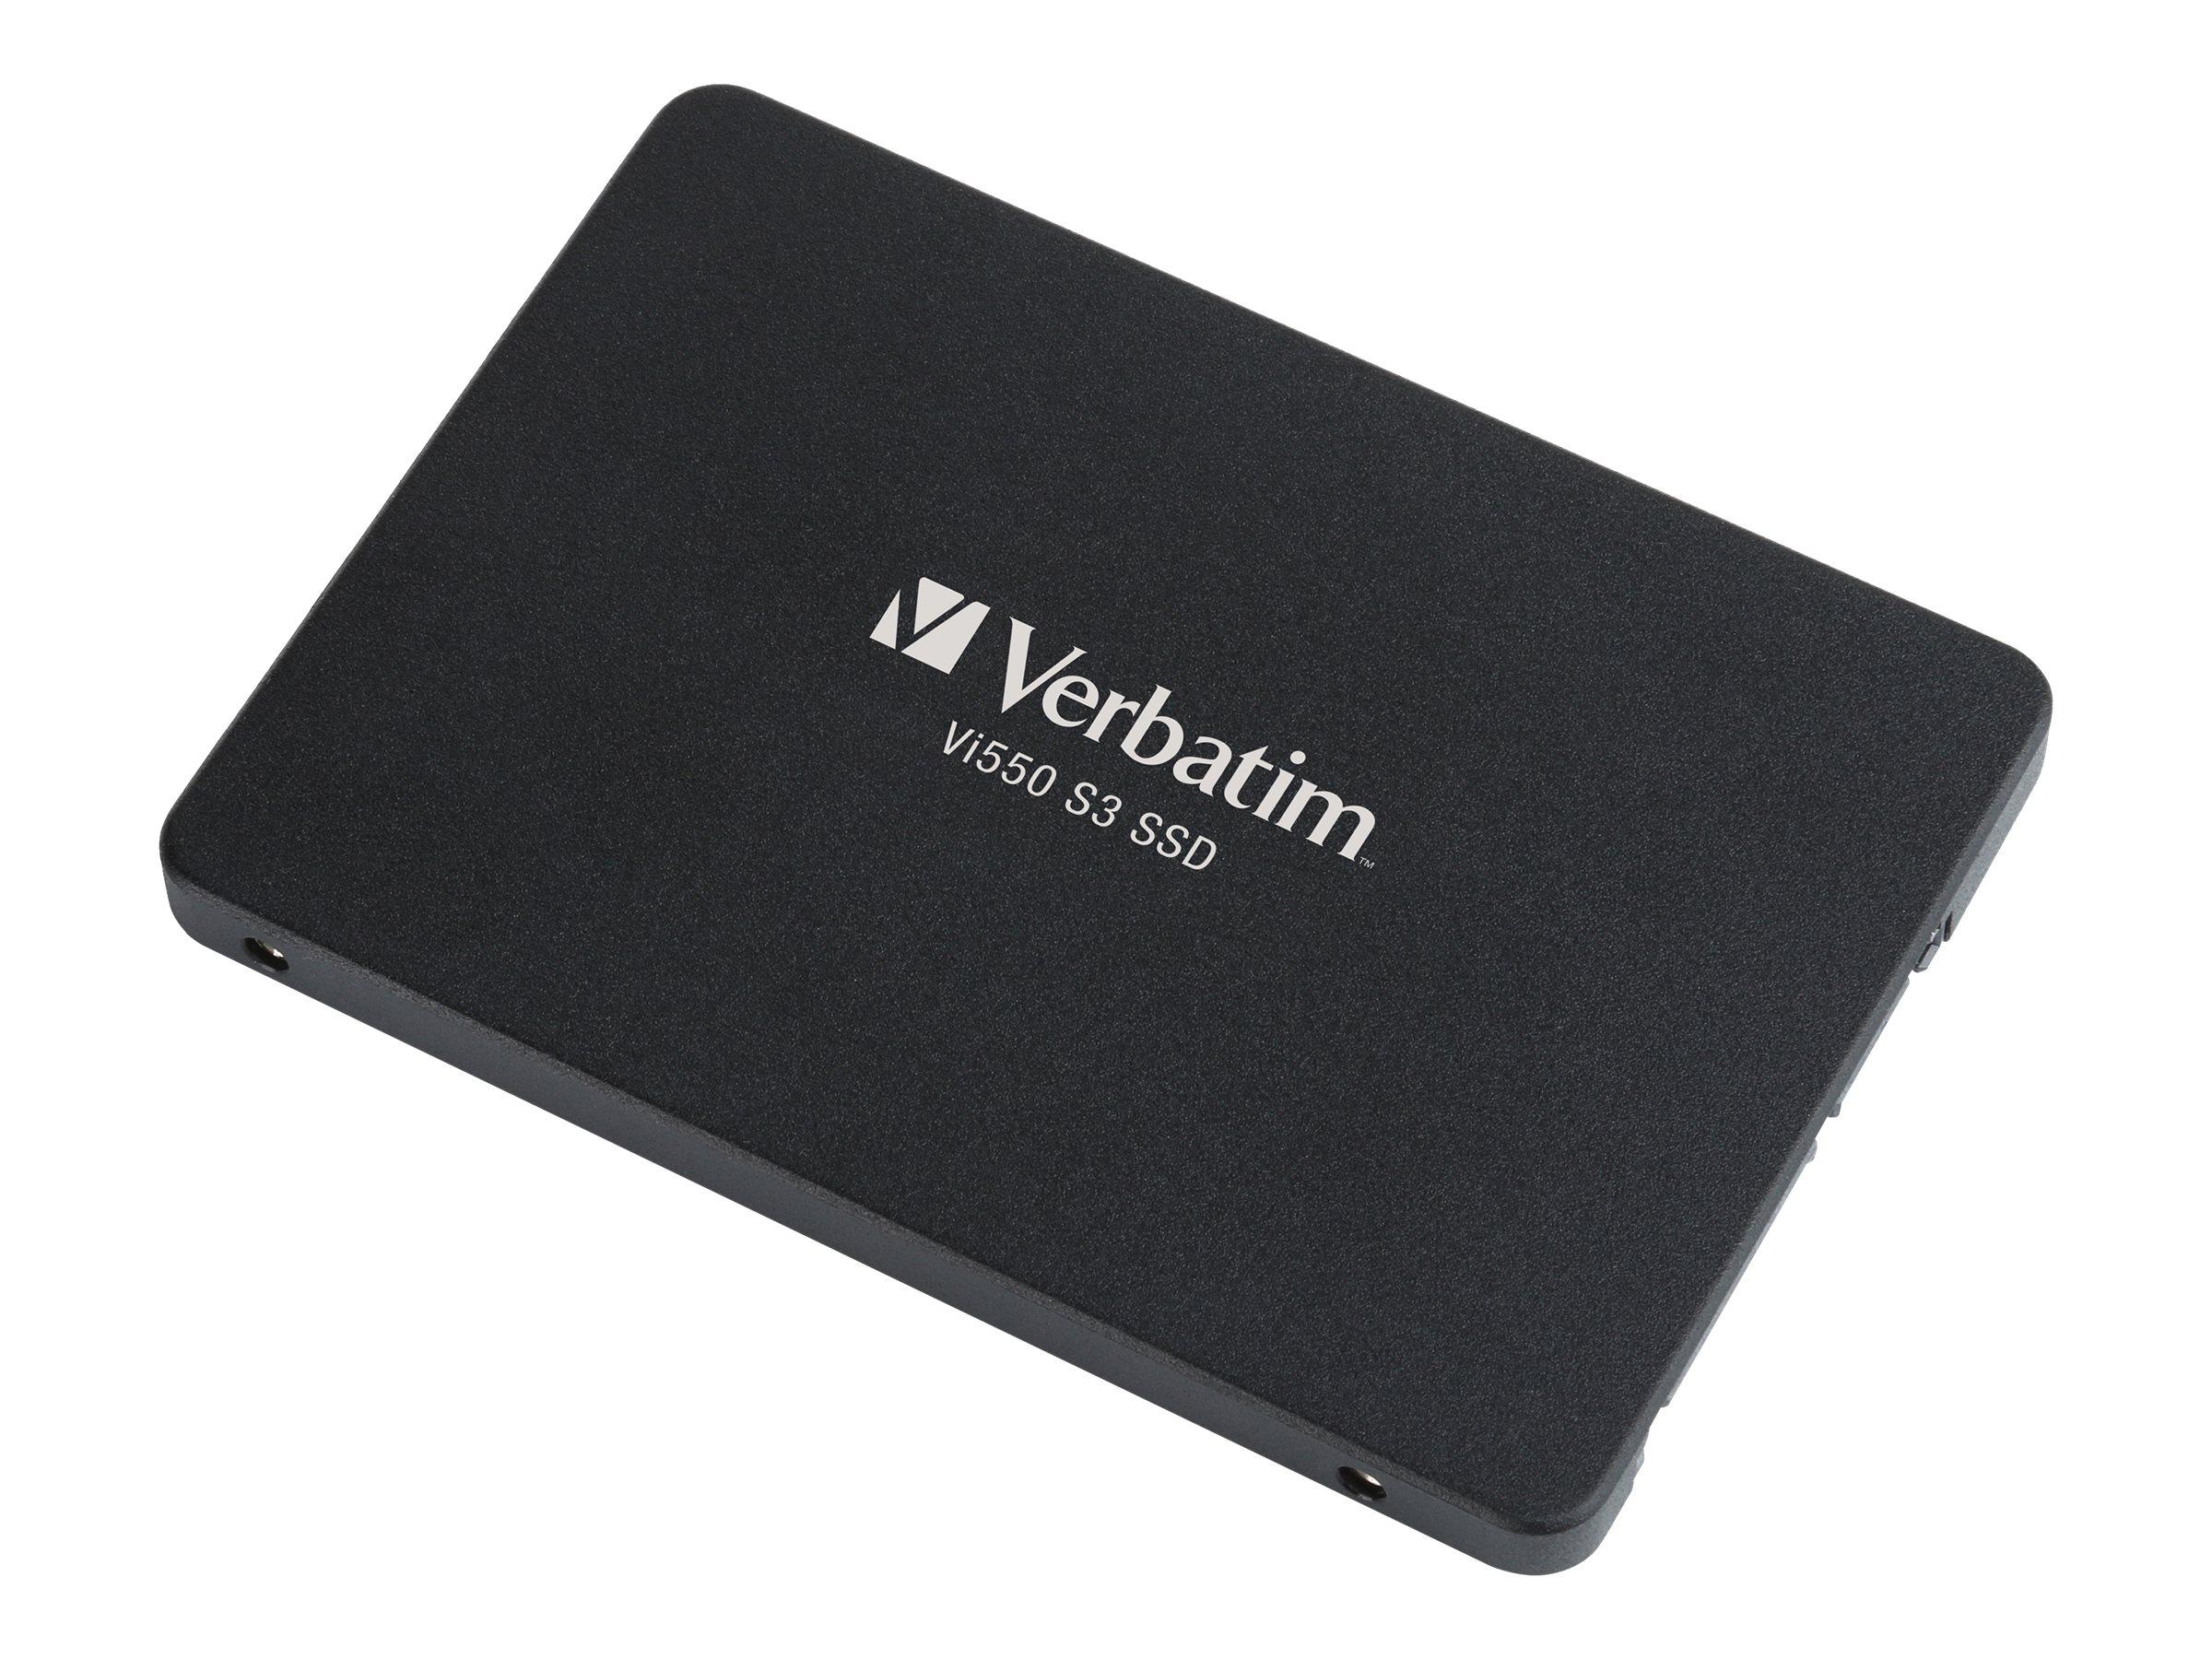 "Verbatim Vi550 - 512 GB SSD - intern - 2.5"" (6.4 cm)"